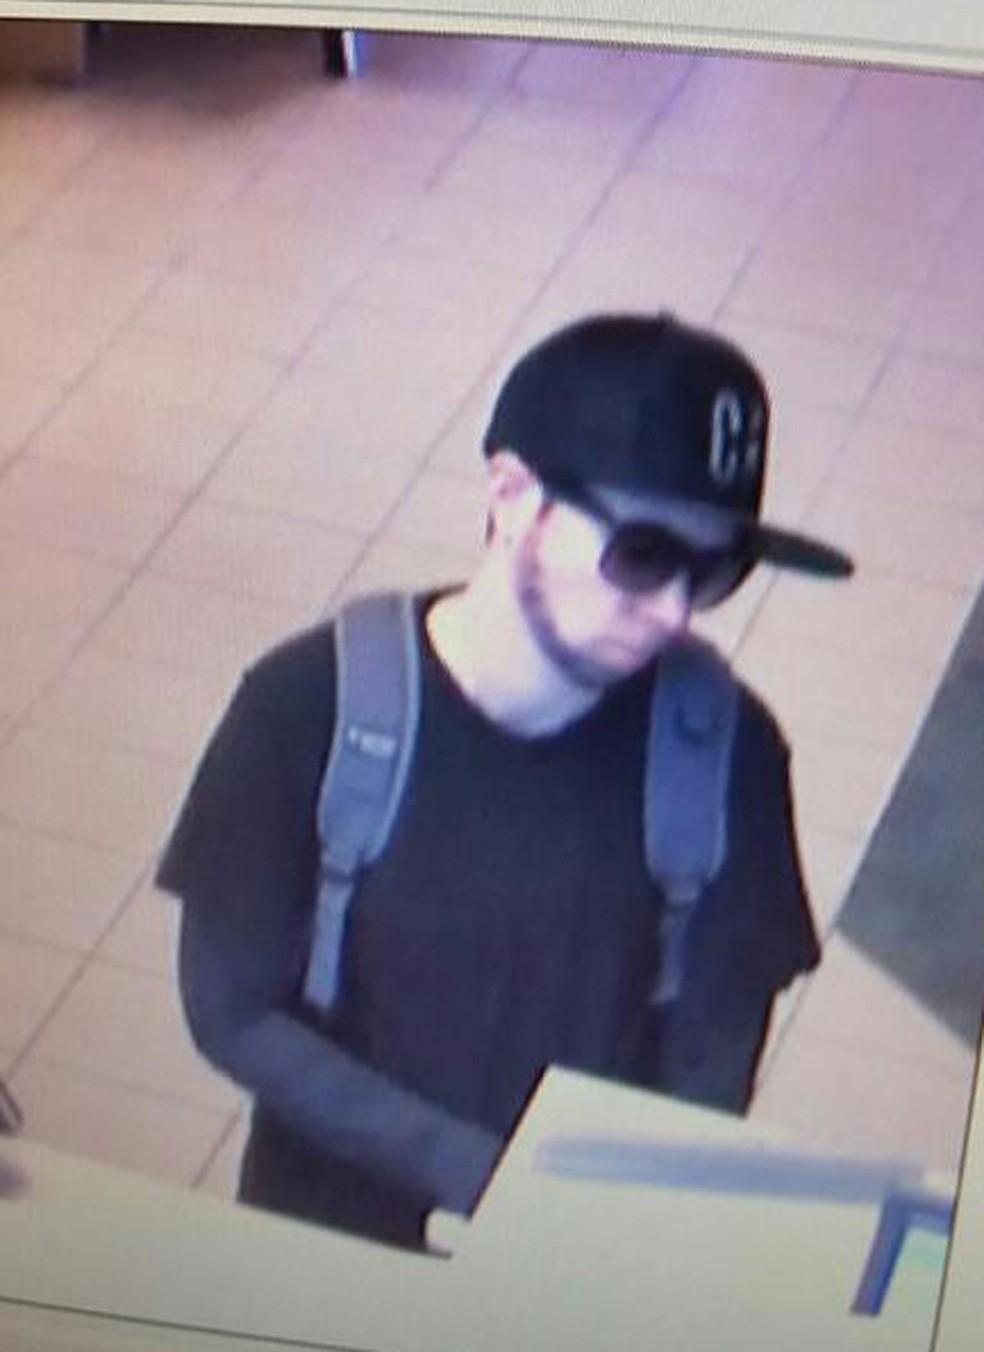 Mulher é presa suspeita de assaltar banco com barba pintada nos EUA (Foto: Danville Police Department/Facebook)